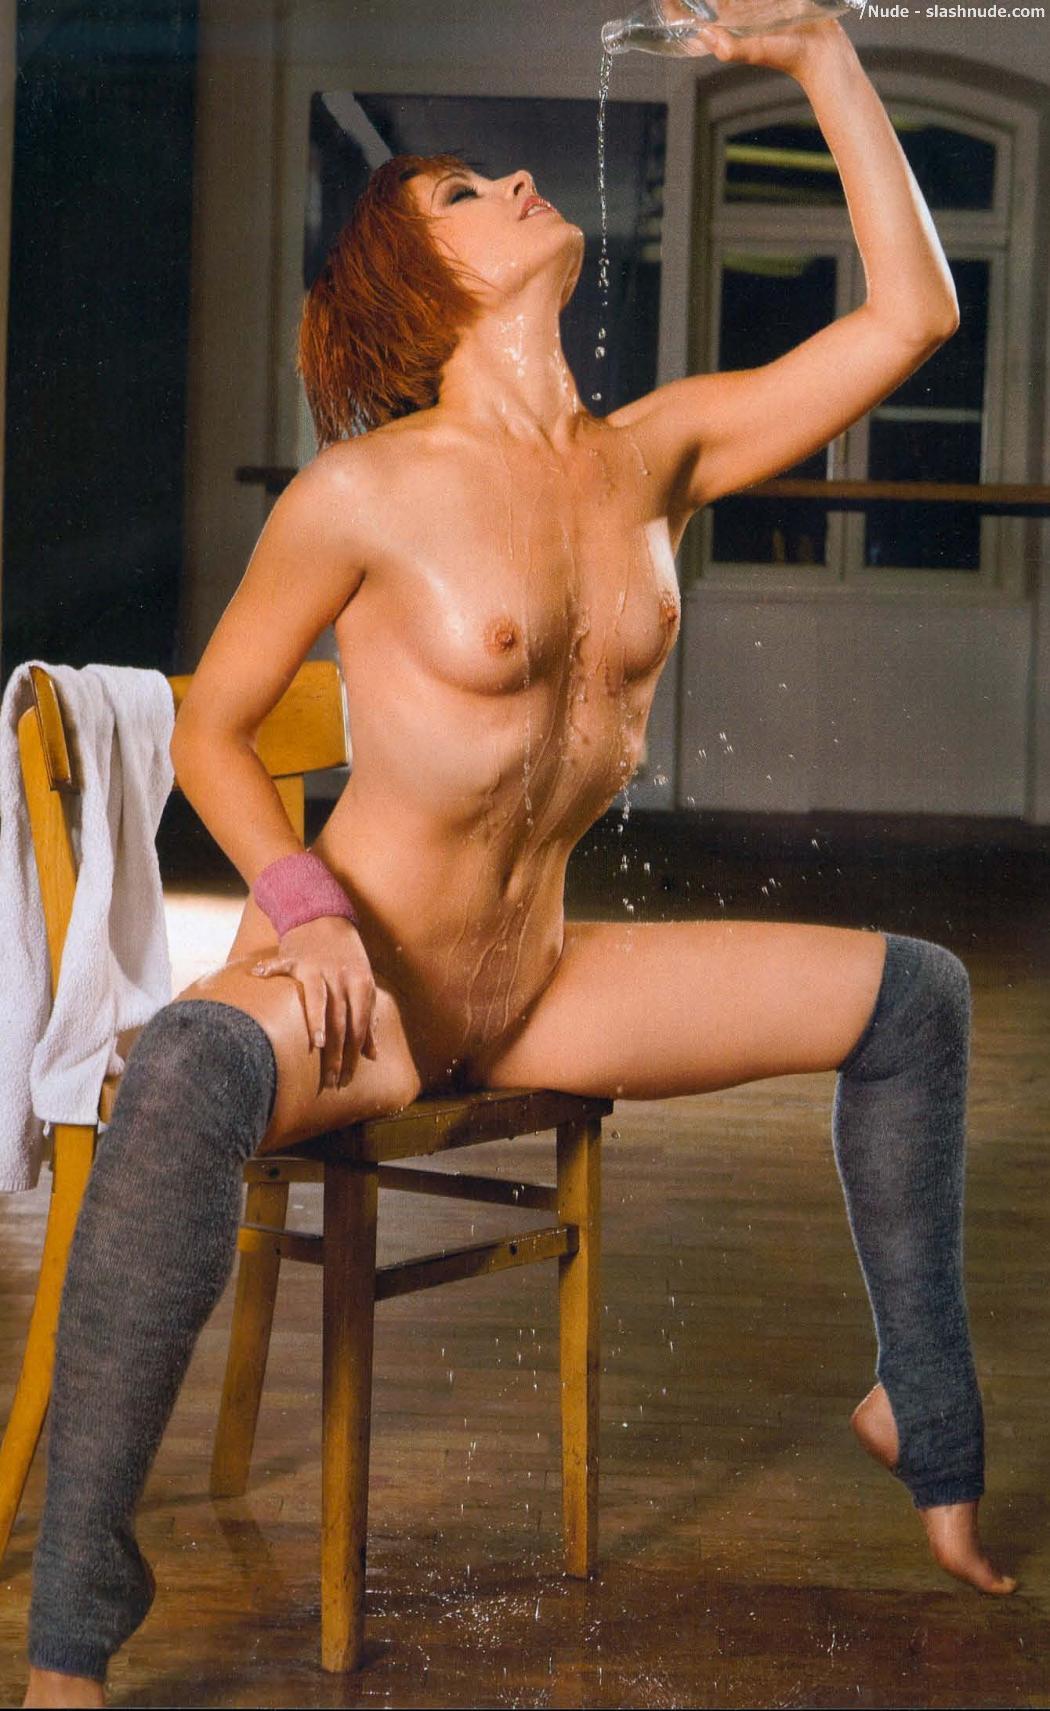 nude ukraine group girls